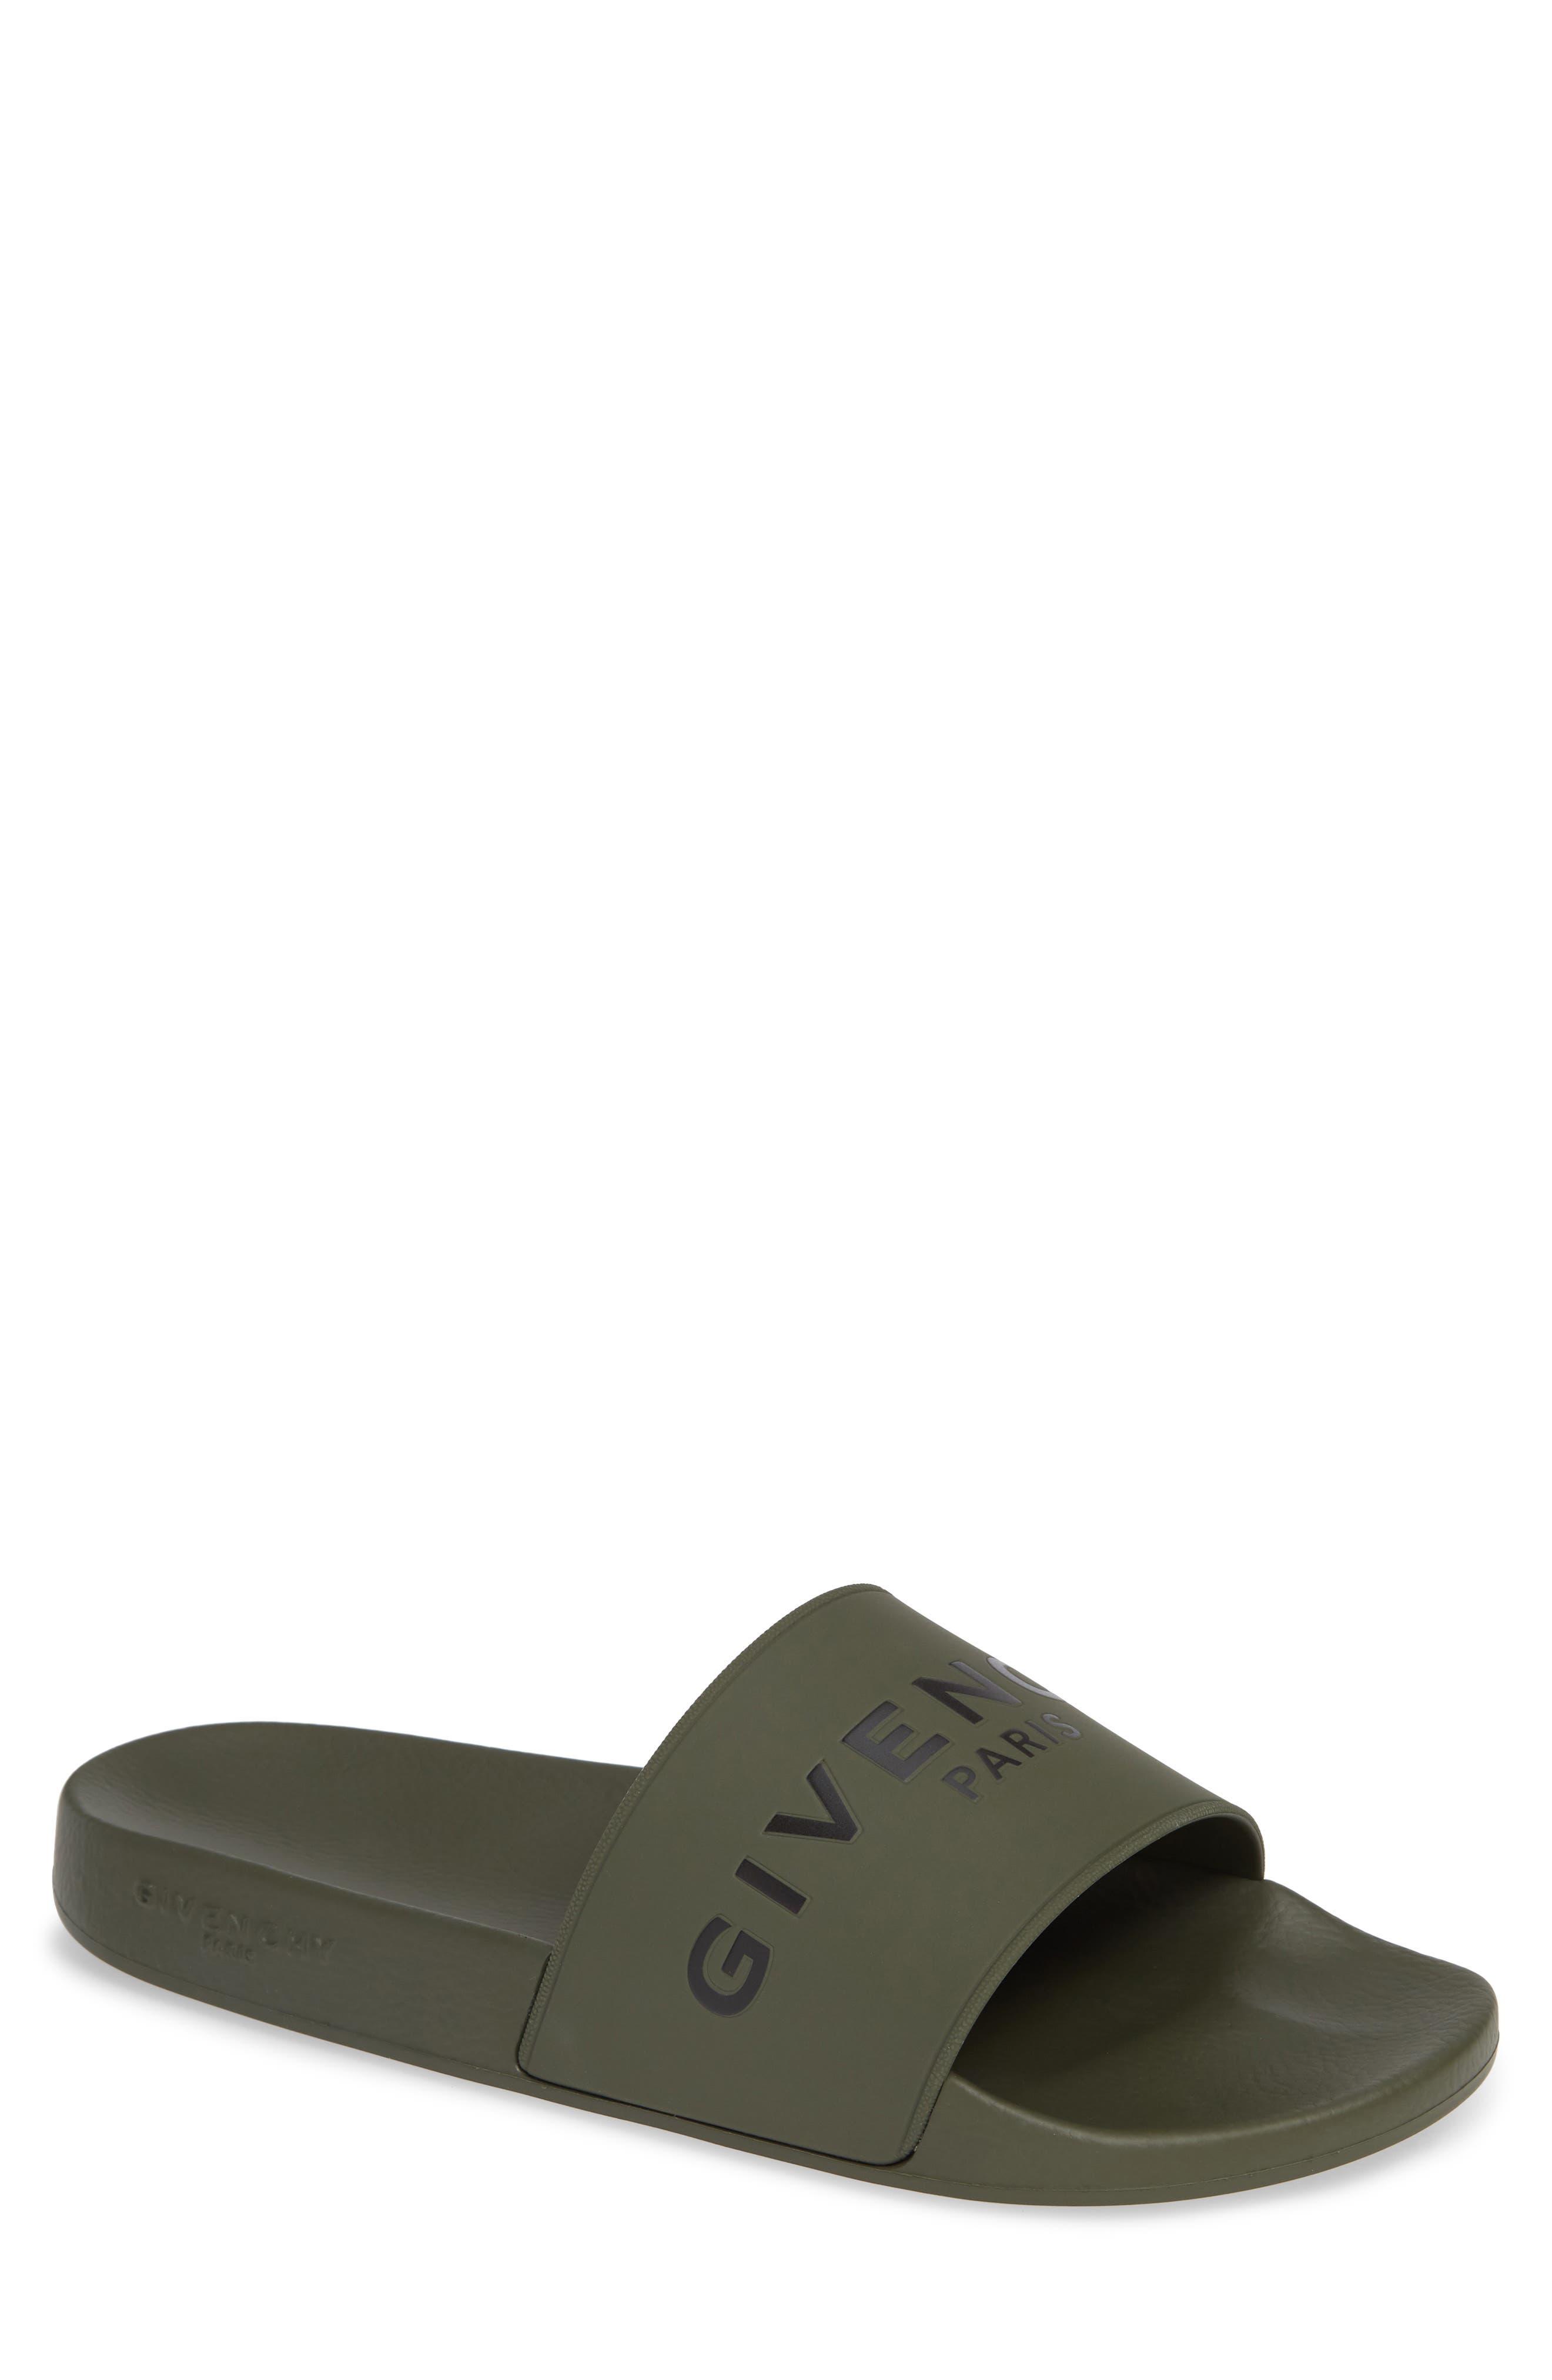 Slide Sandal,                         Main,                         color, DARK KHAKI